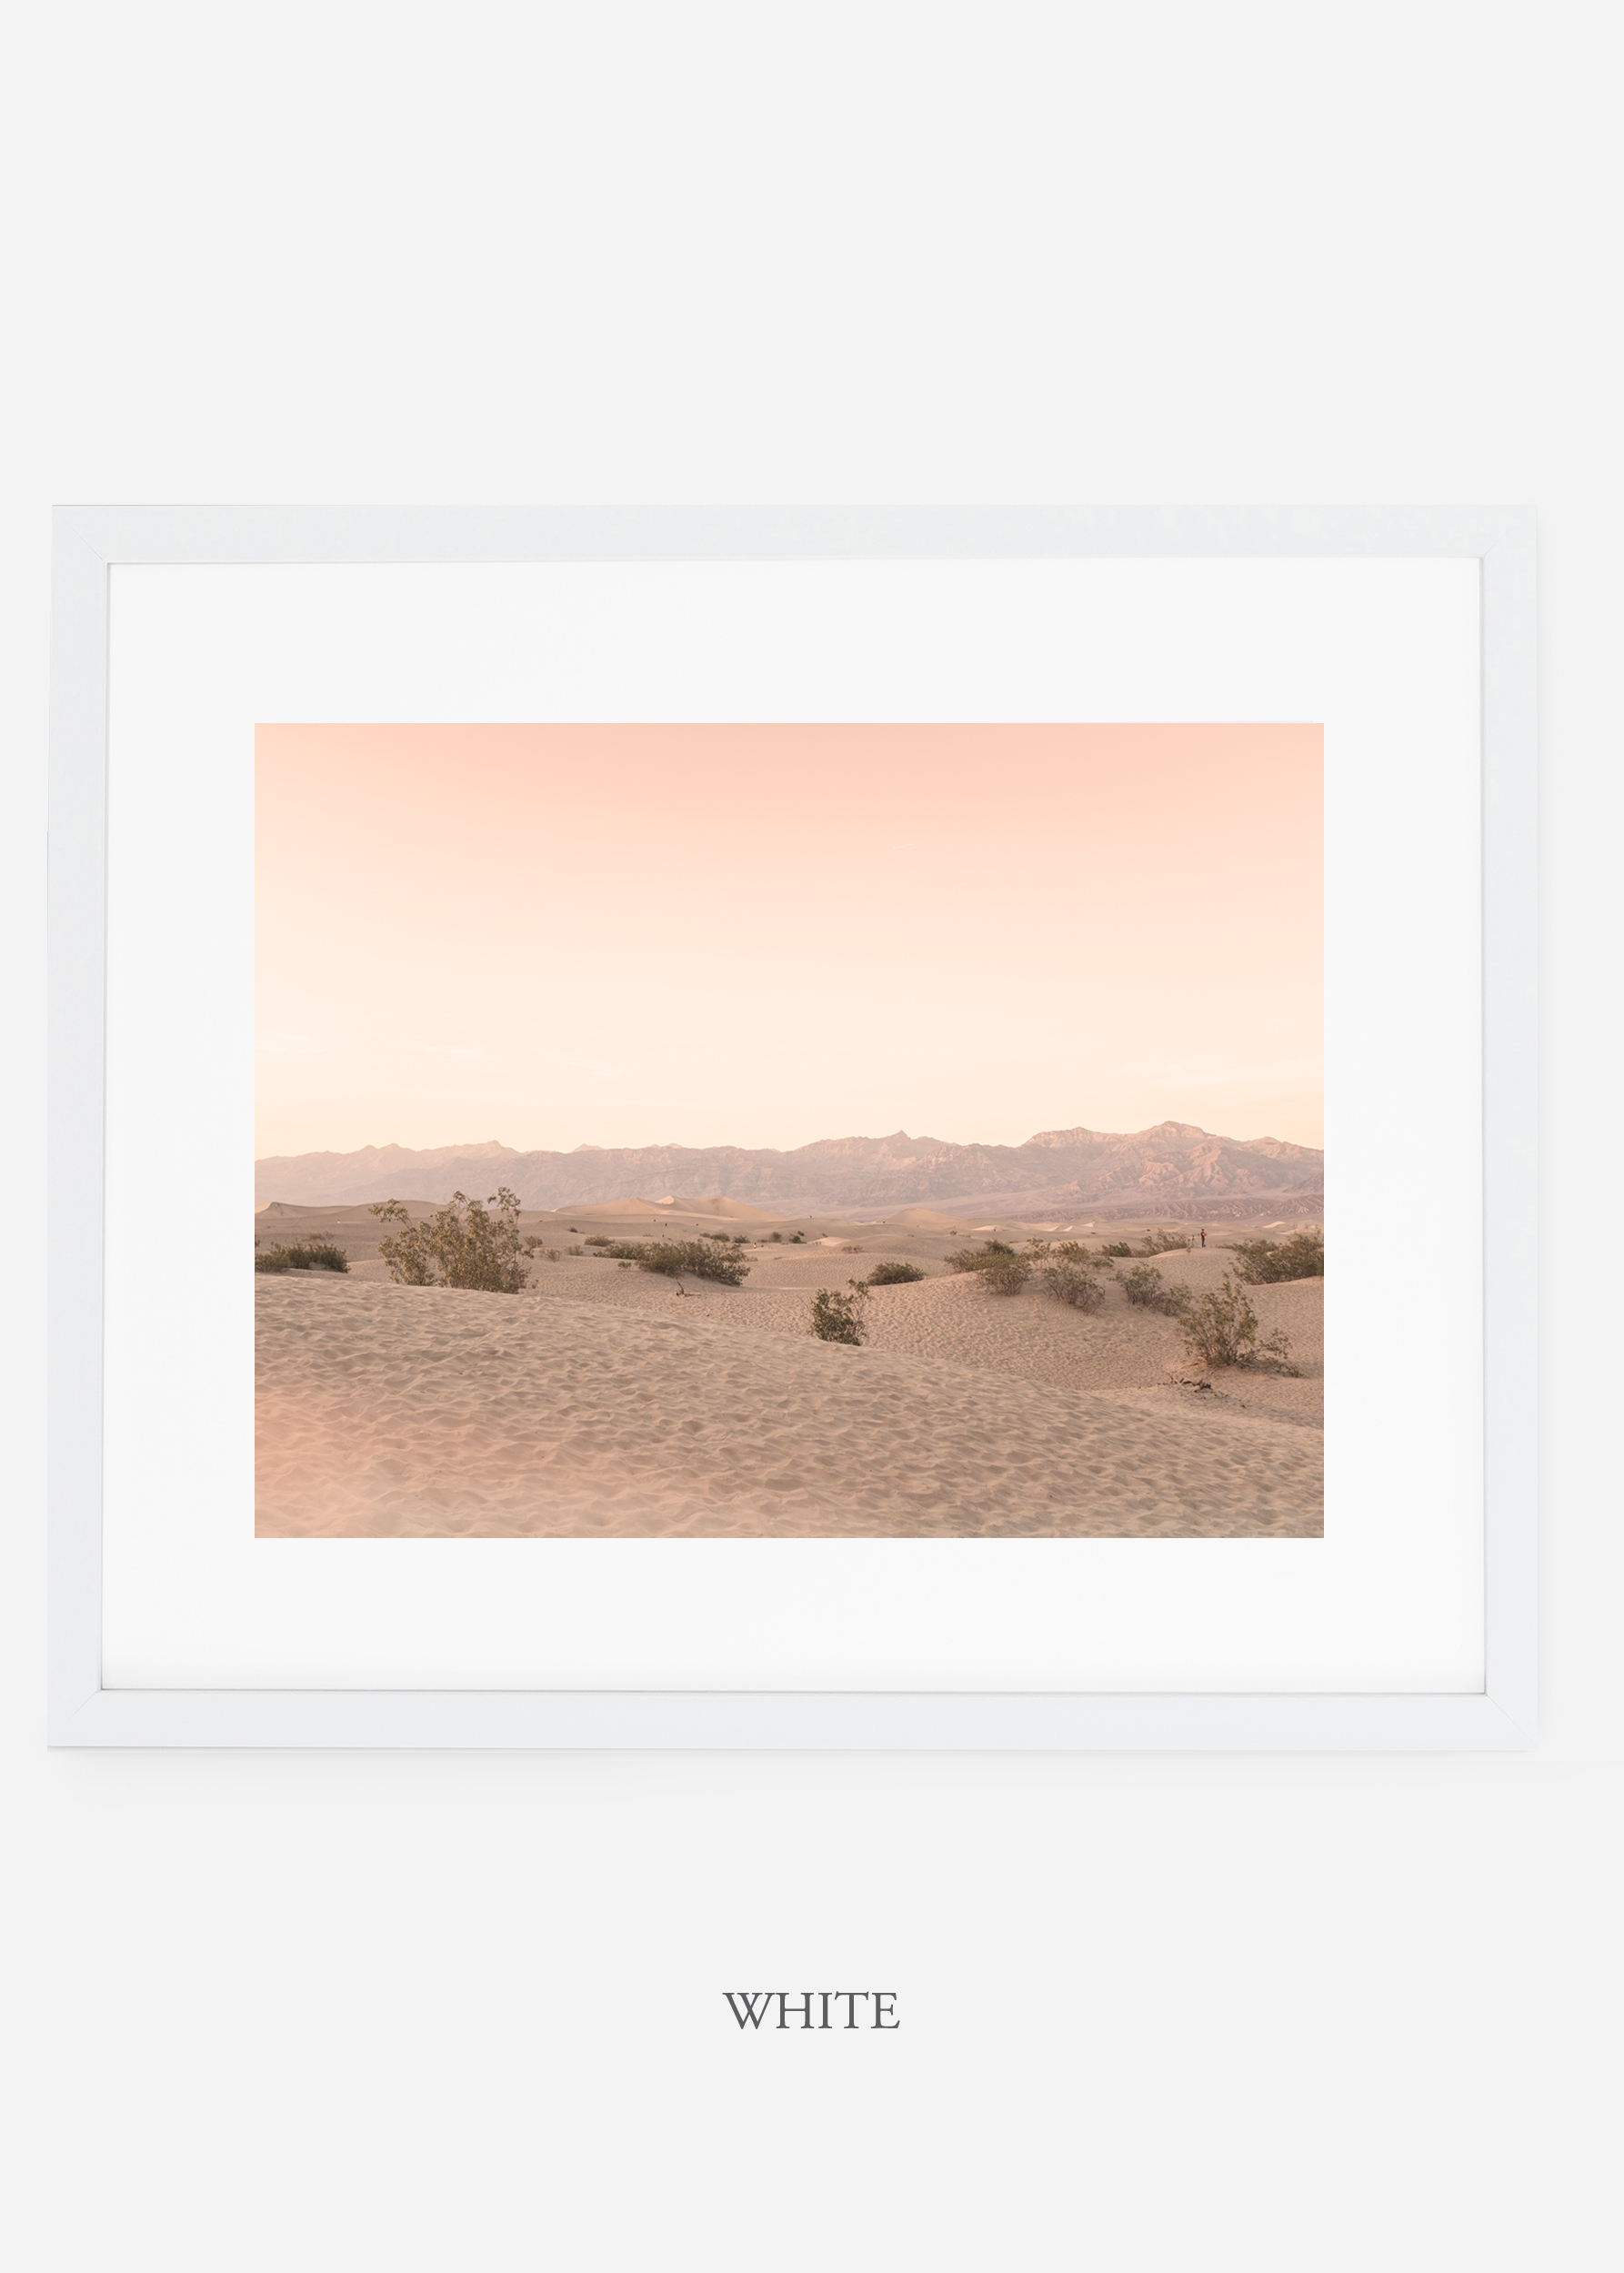 wildercalifornia_whiteframe_deathvalley_4_minimal_cactus_art_interiordesign_blackandwhite.jpg